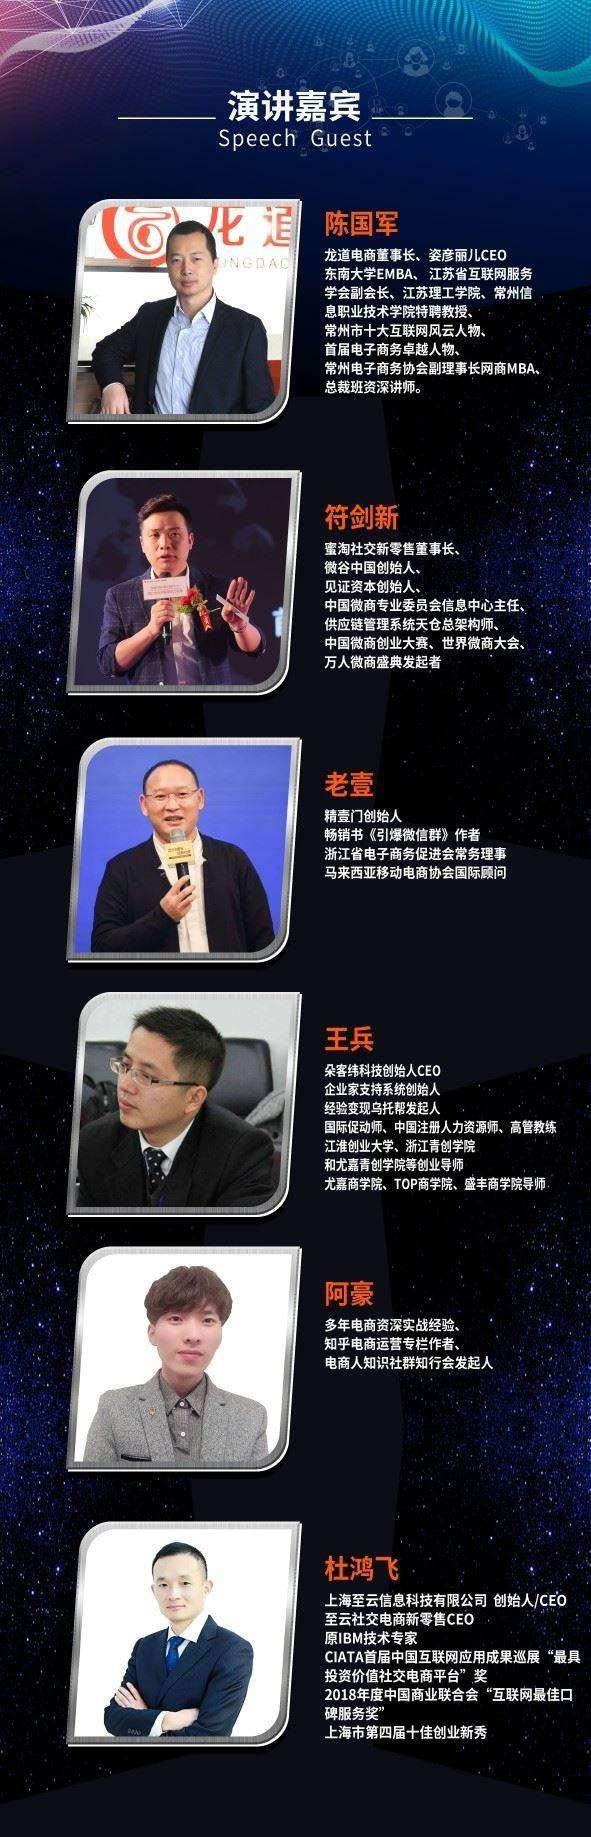 http://www.huodongxing.com/file/20160918/2862452997221/733363721999858.jpg